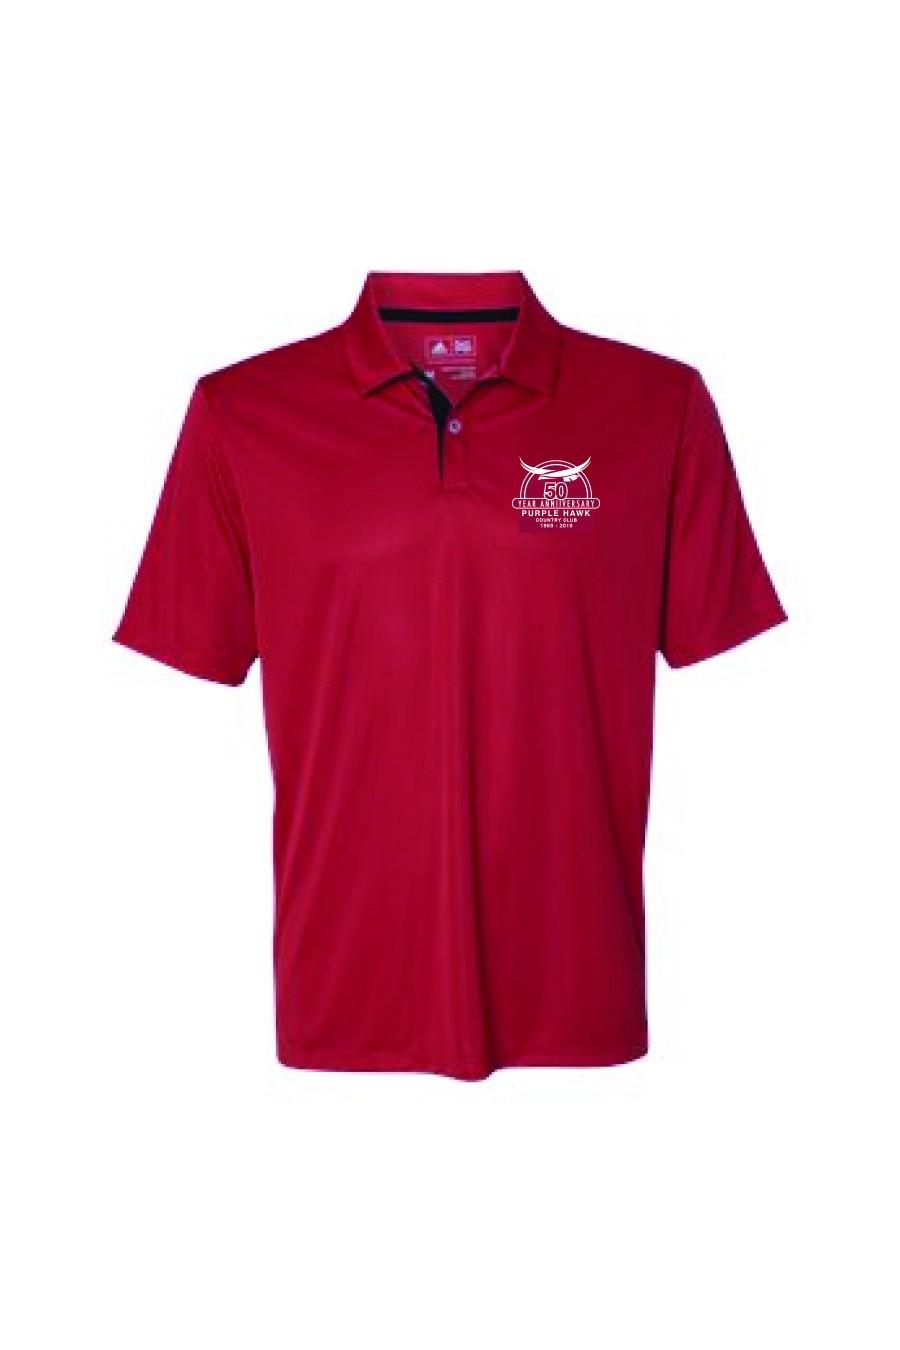 Adidas - Gradient 3-Stripes Sport Shirt